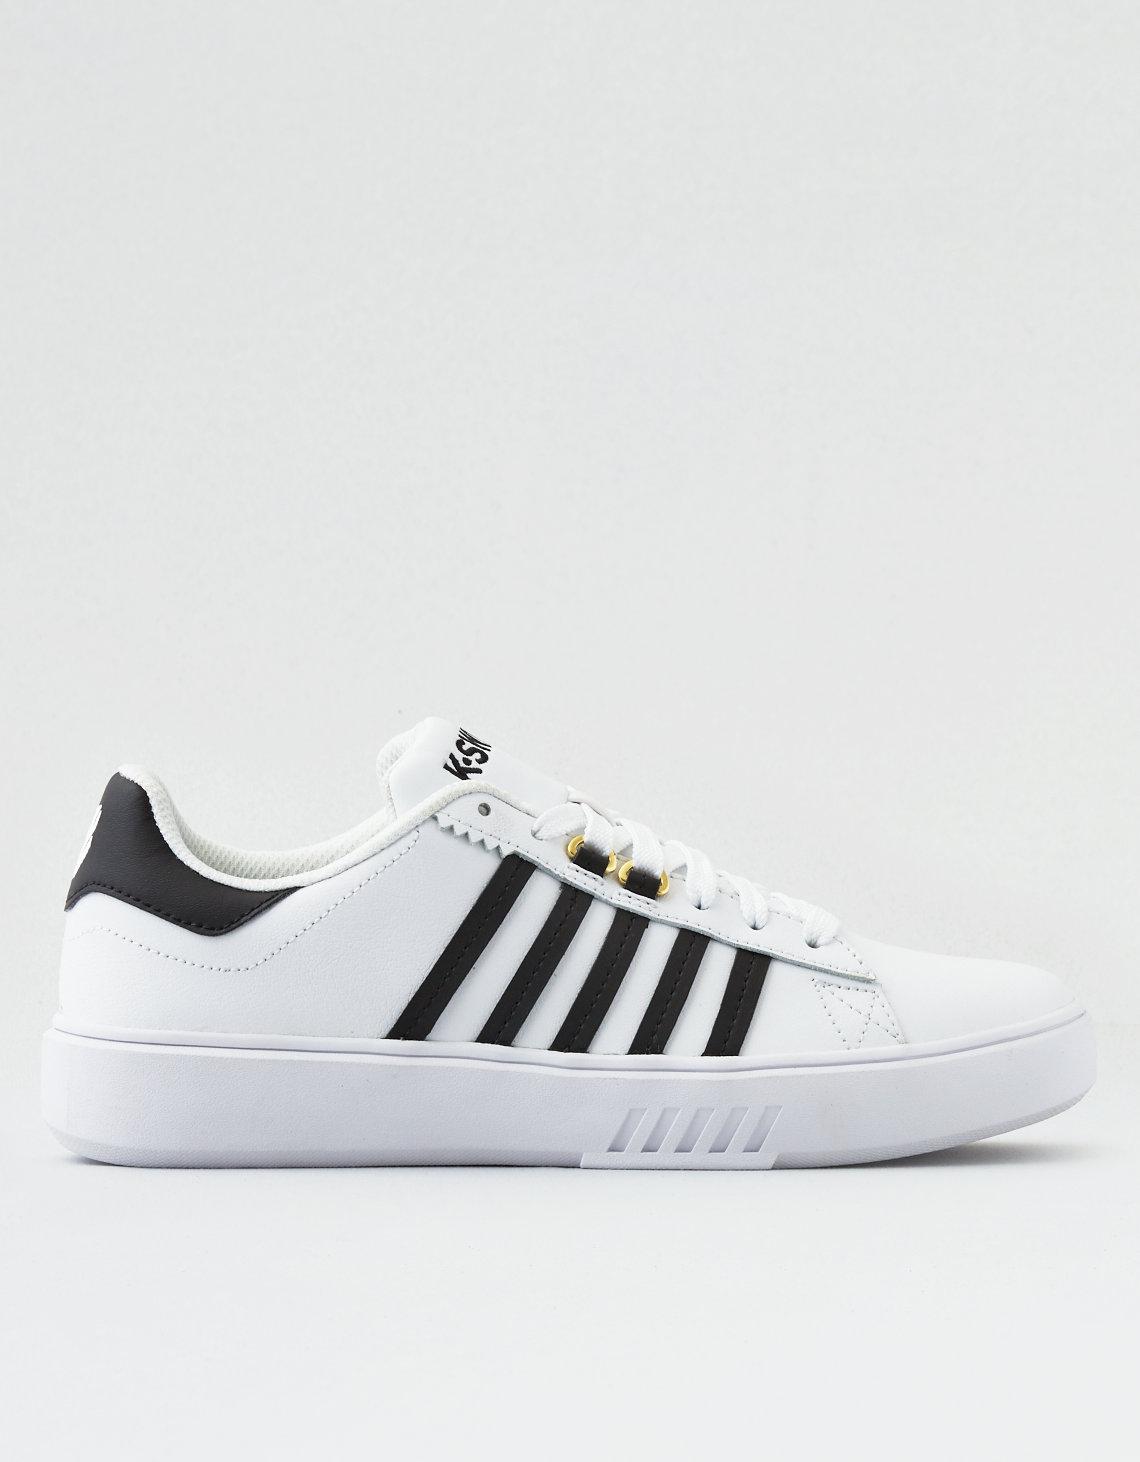 0d475719ae62d K-Swiss Pershing Court Cmf Sneaker